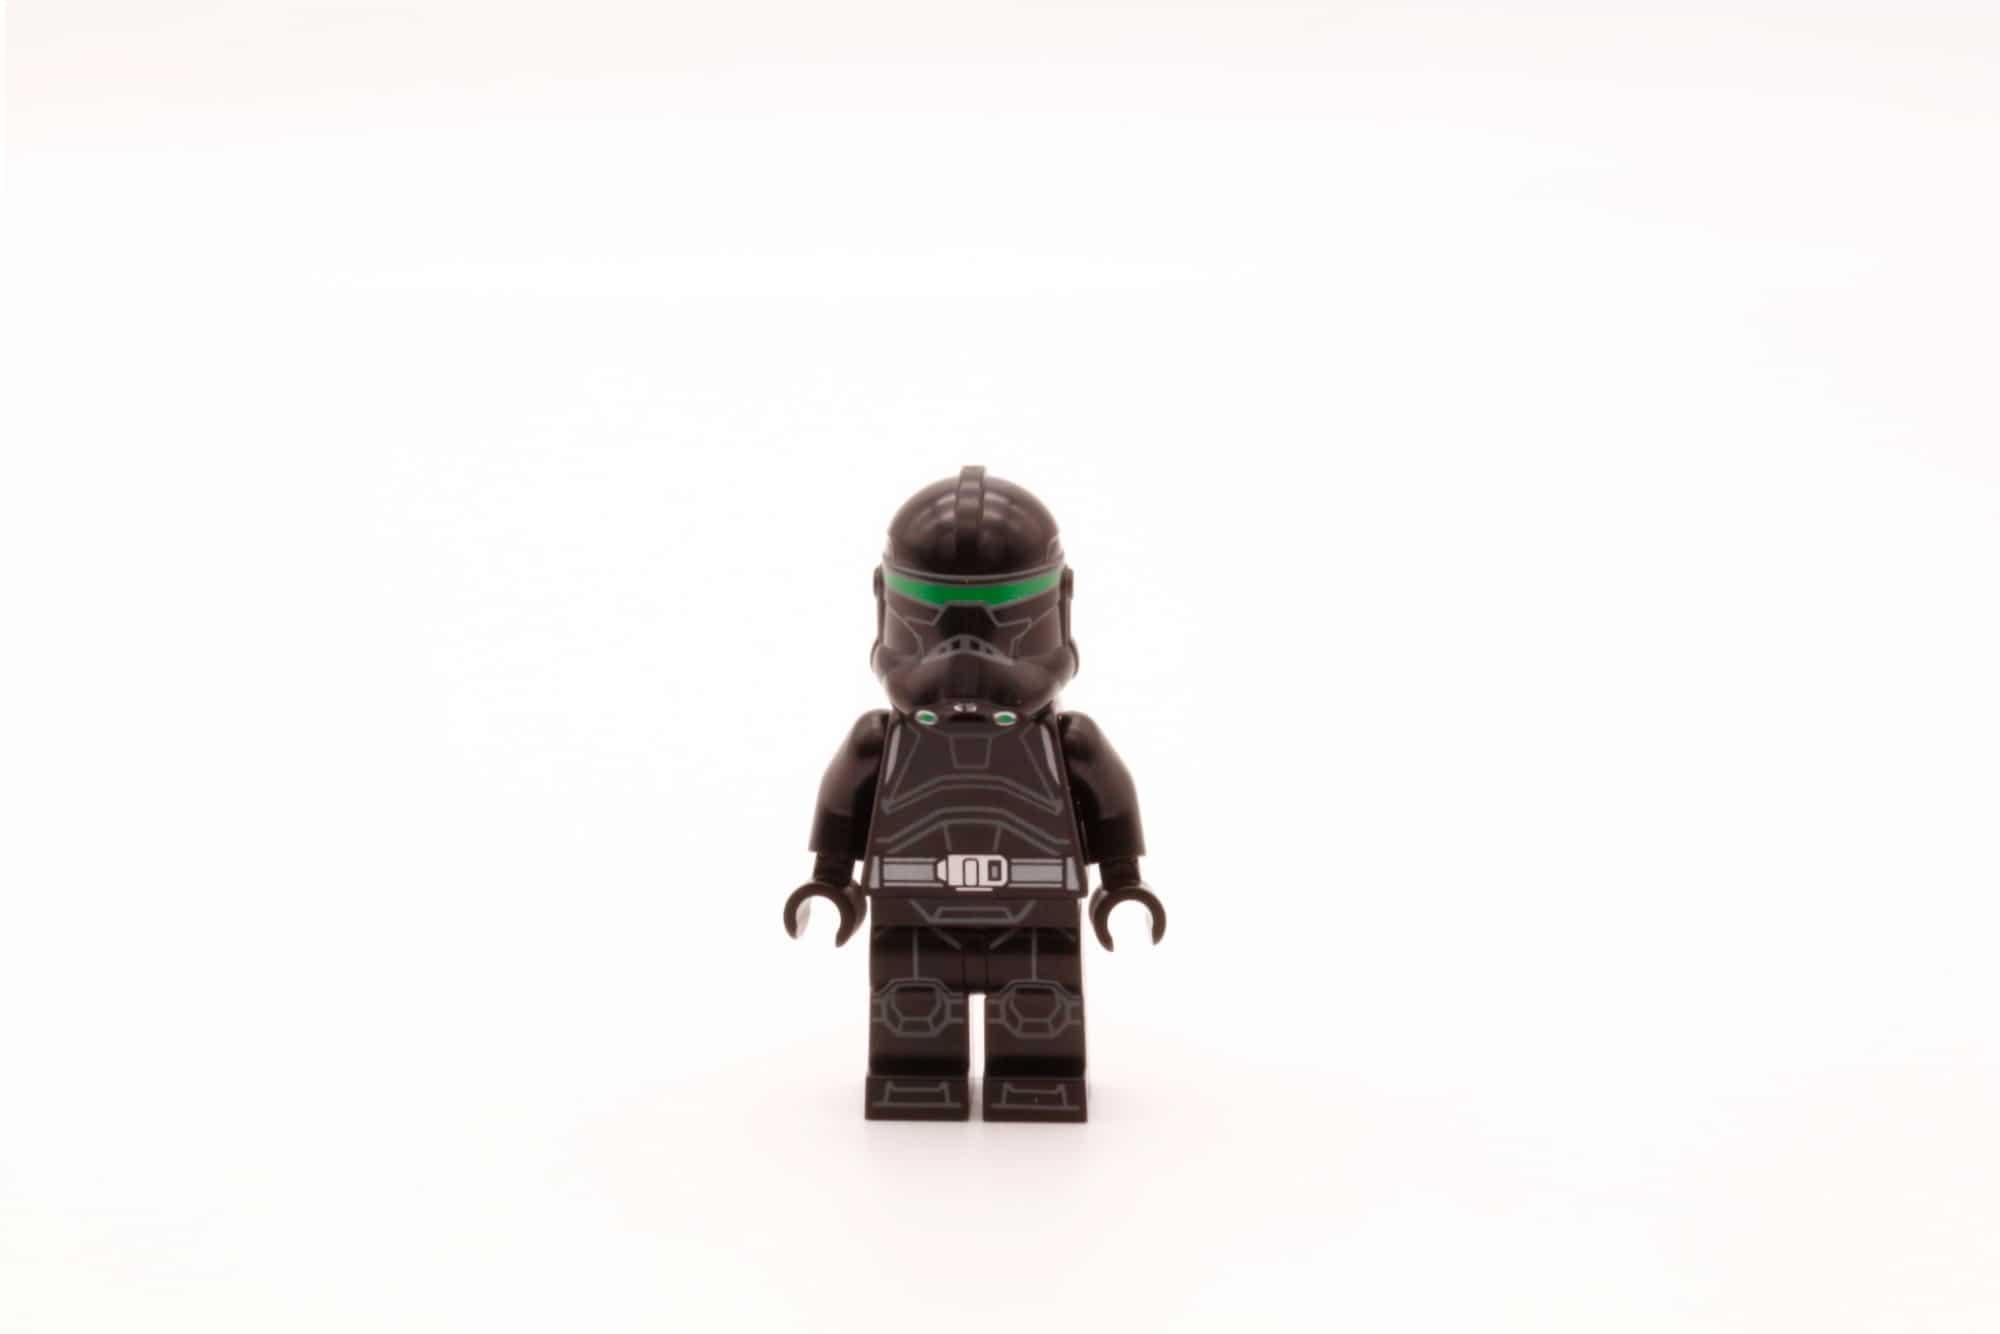 LEGO Star Wars 75314 The Bad Batch Attack Shuttle Crosshair Helm